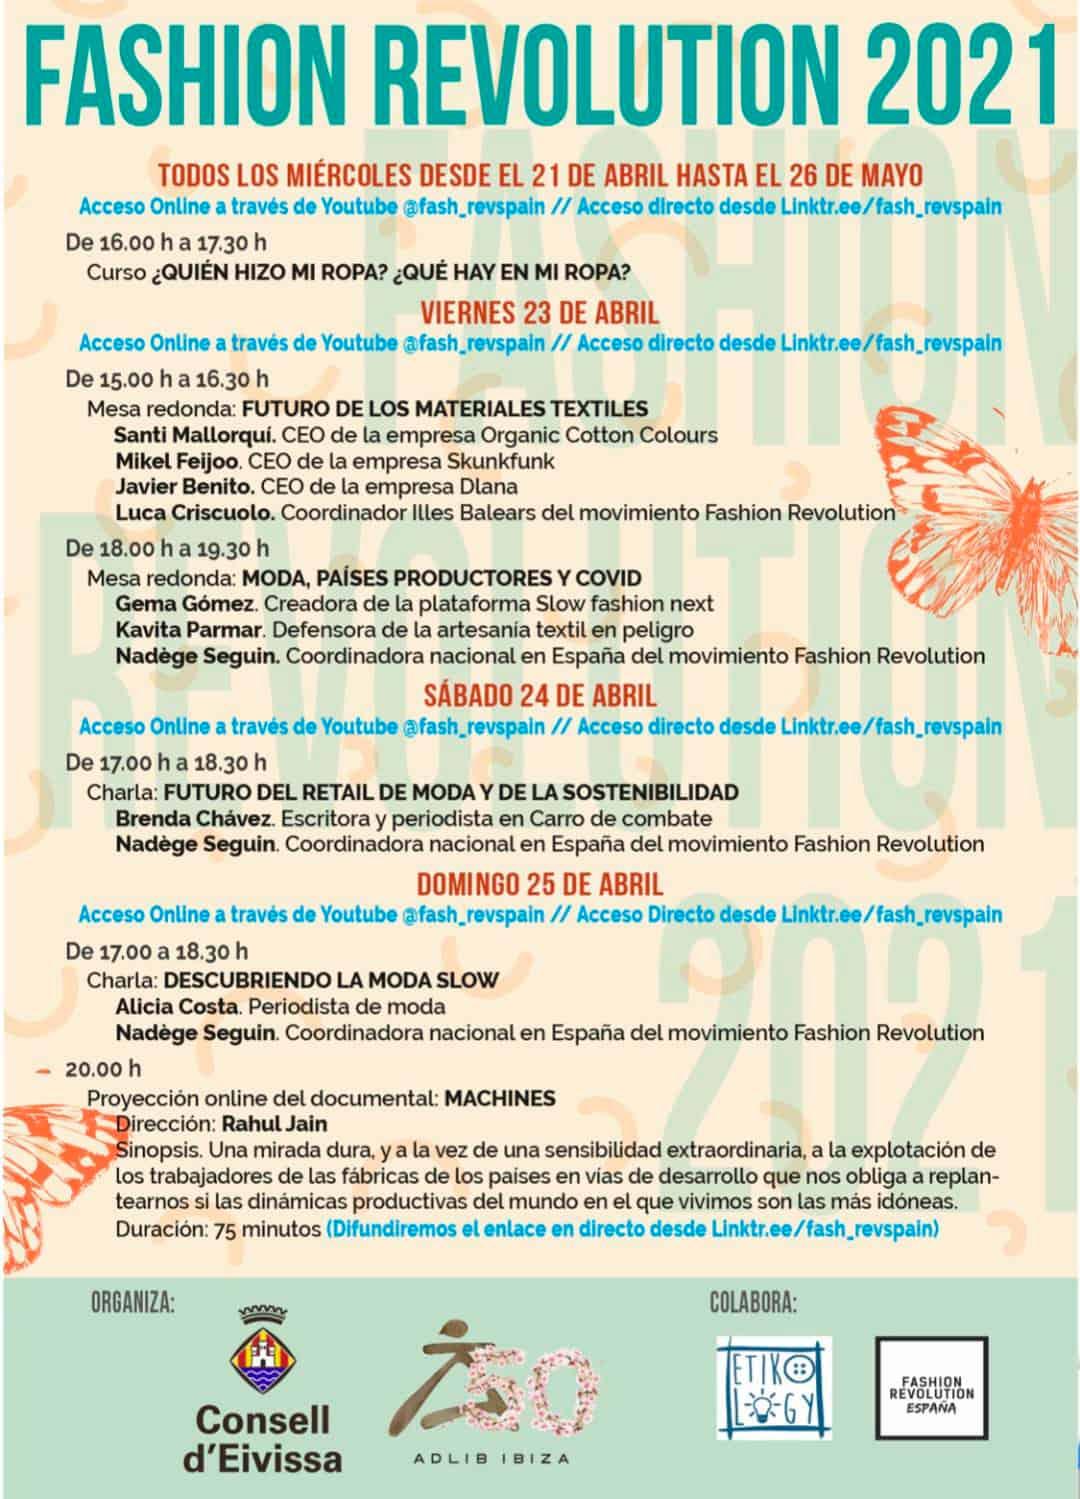 programa-fashion-revolution-day-ibiza-2021-welcometoibiza